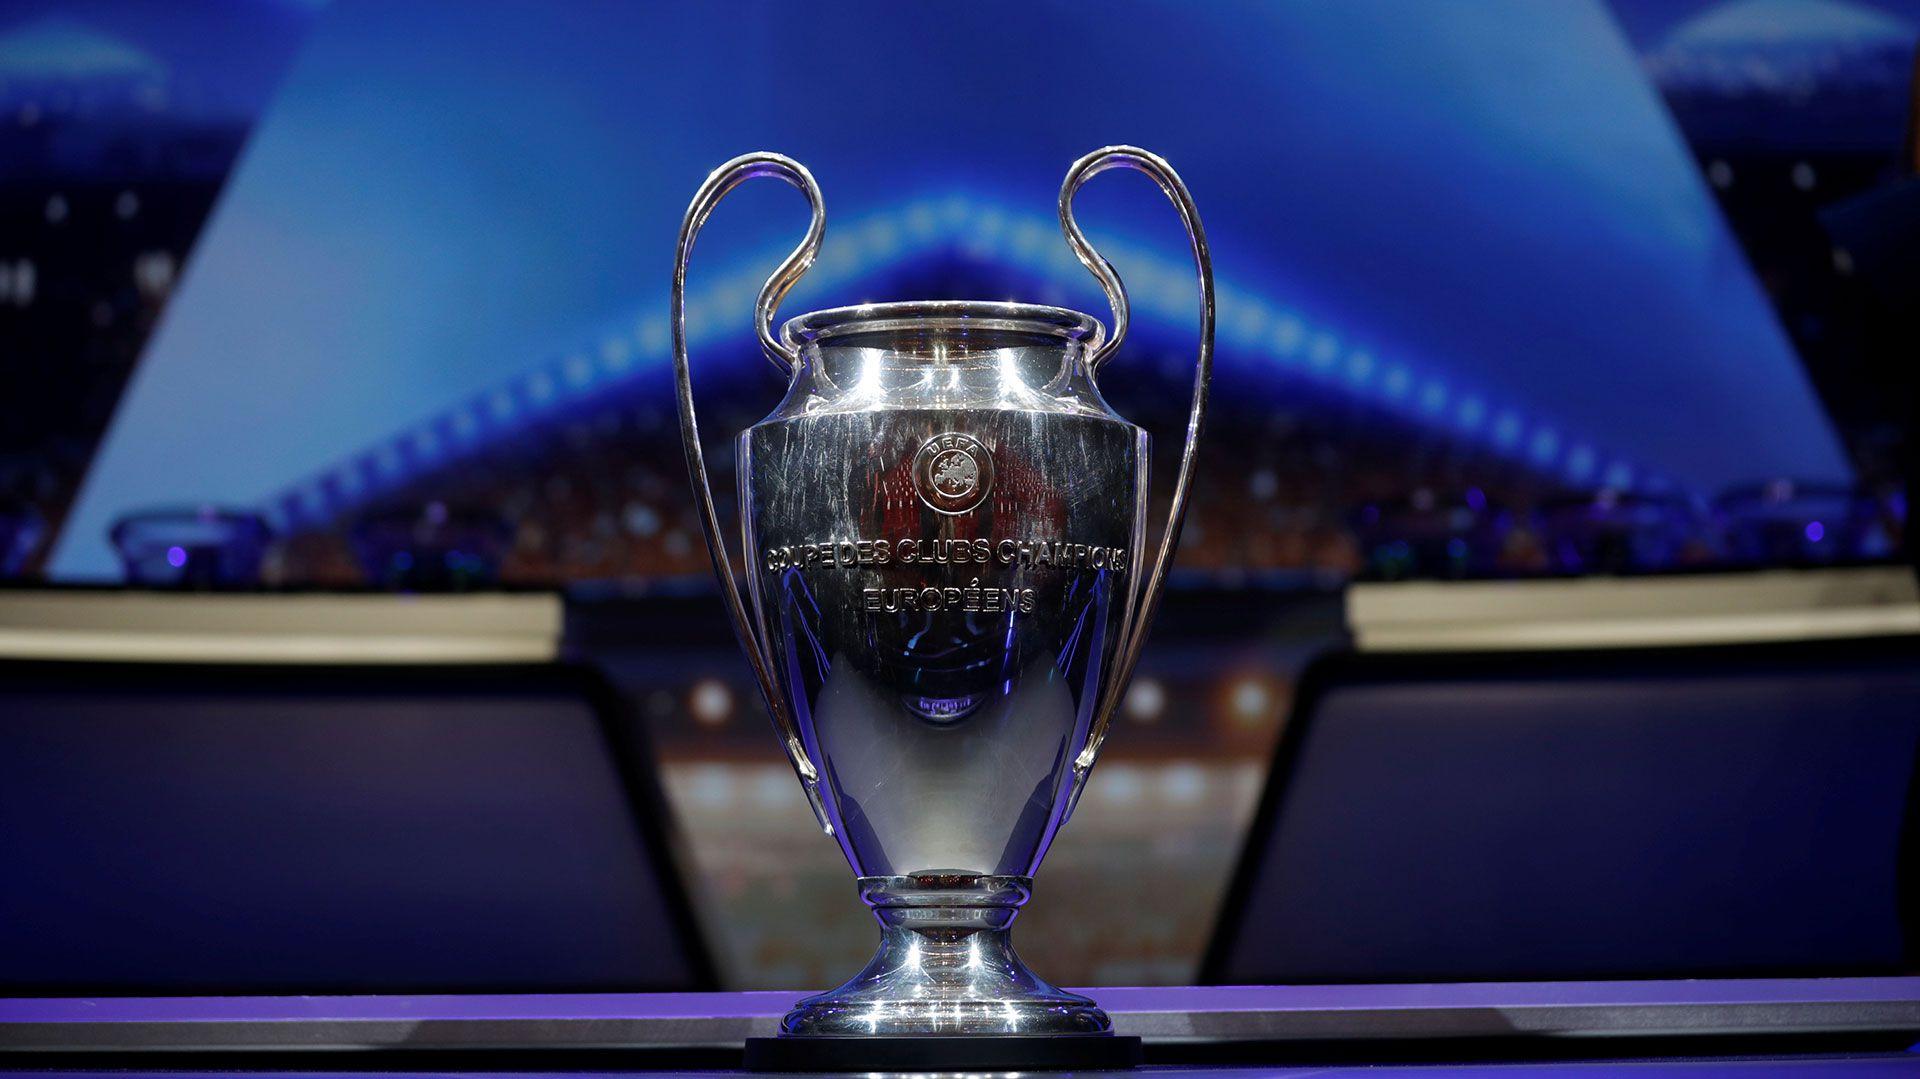 Arranca una nueva carrera por la Champions (Reuters)